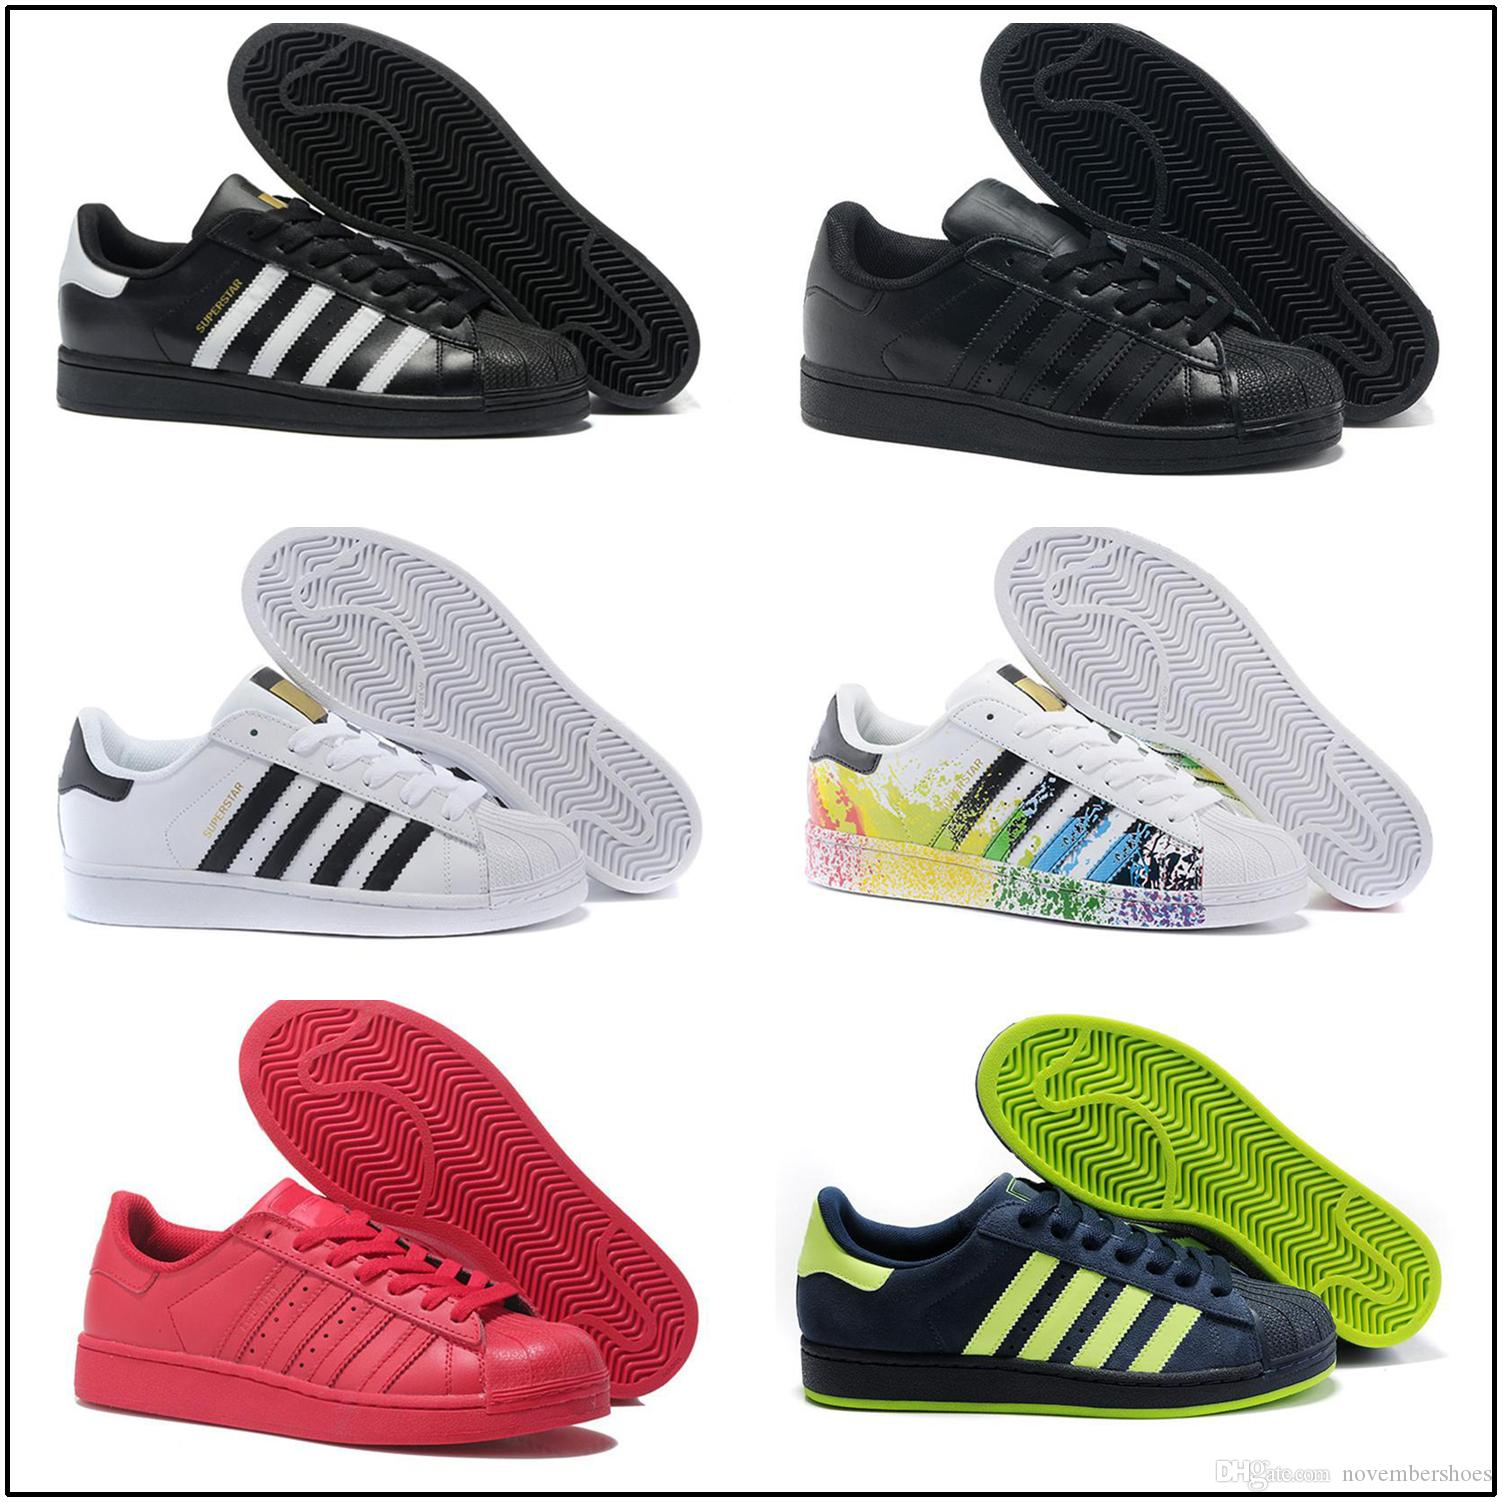 Acheter Adidas Superstar Super Star Stan Smith Superstar Original Blanc Hologramme Iridescent Junior Or Superstars Baskets Femmes Hommes Sport